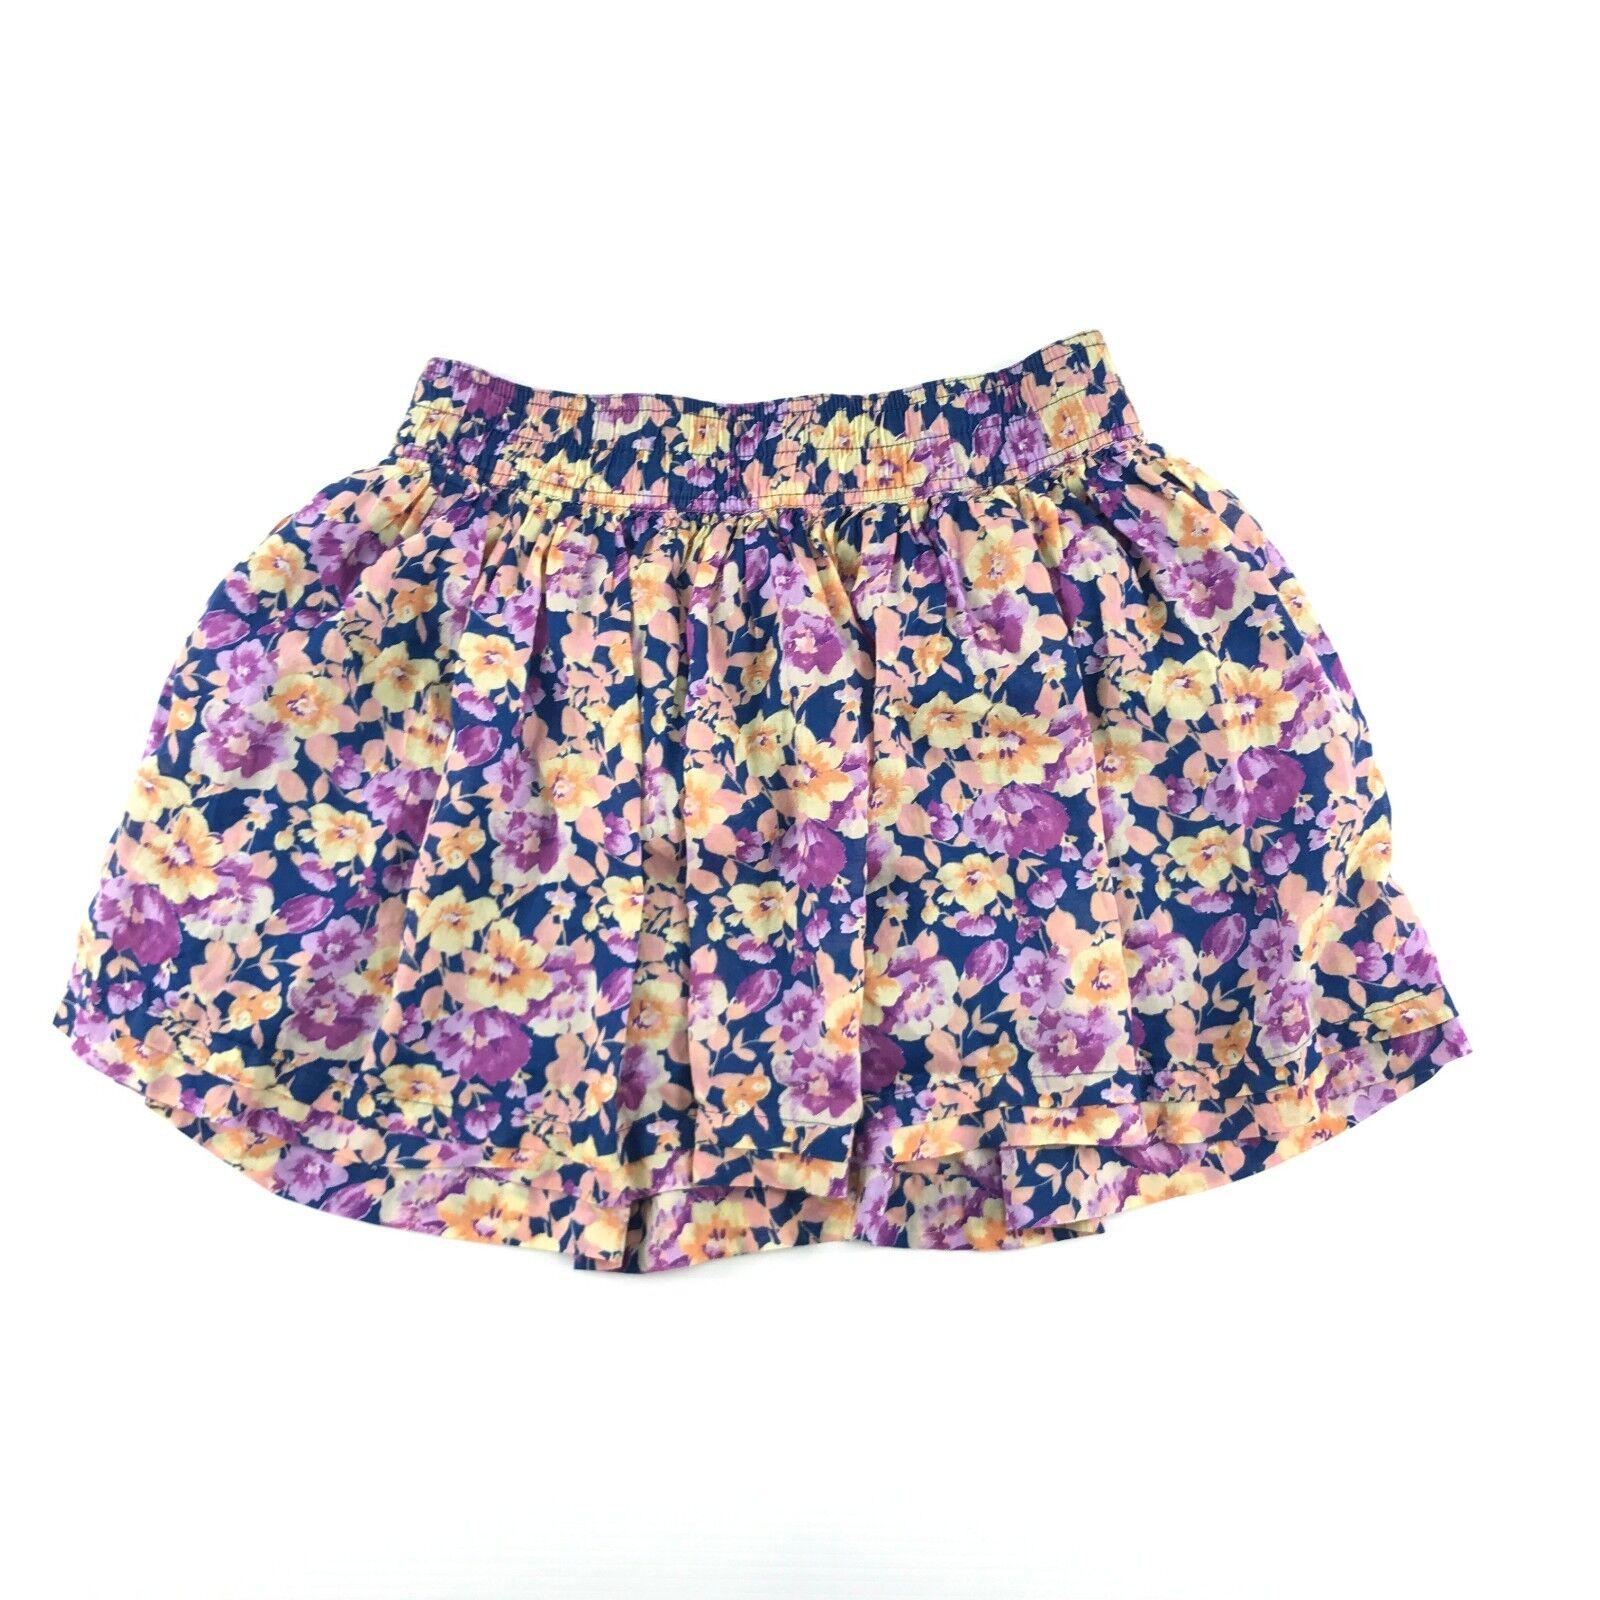 Forever 21 Womens bluee Floral Print Elastic Waist Lined Mini Skirt L